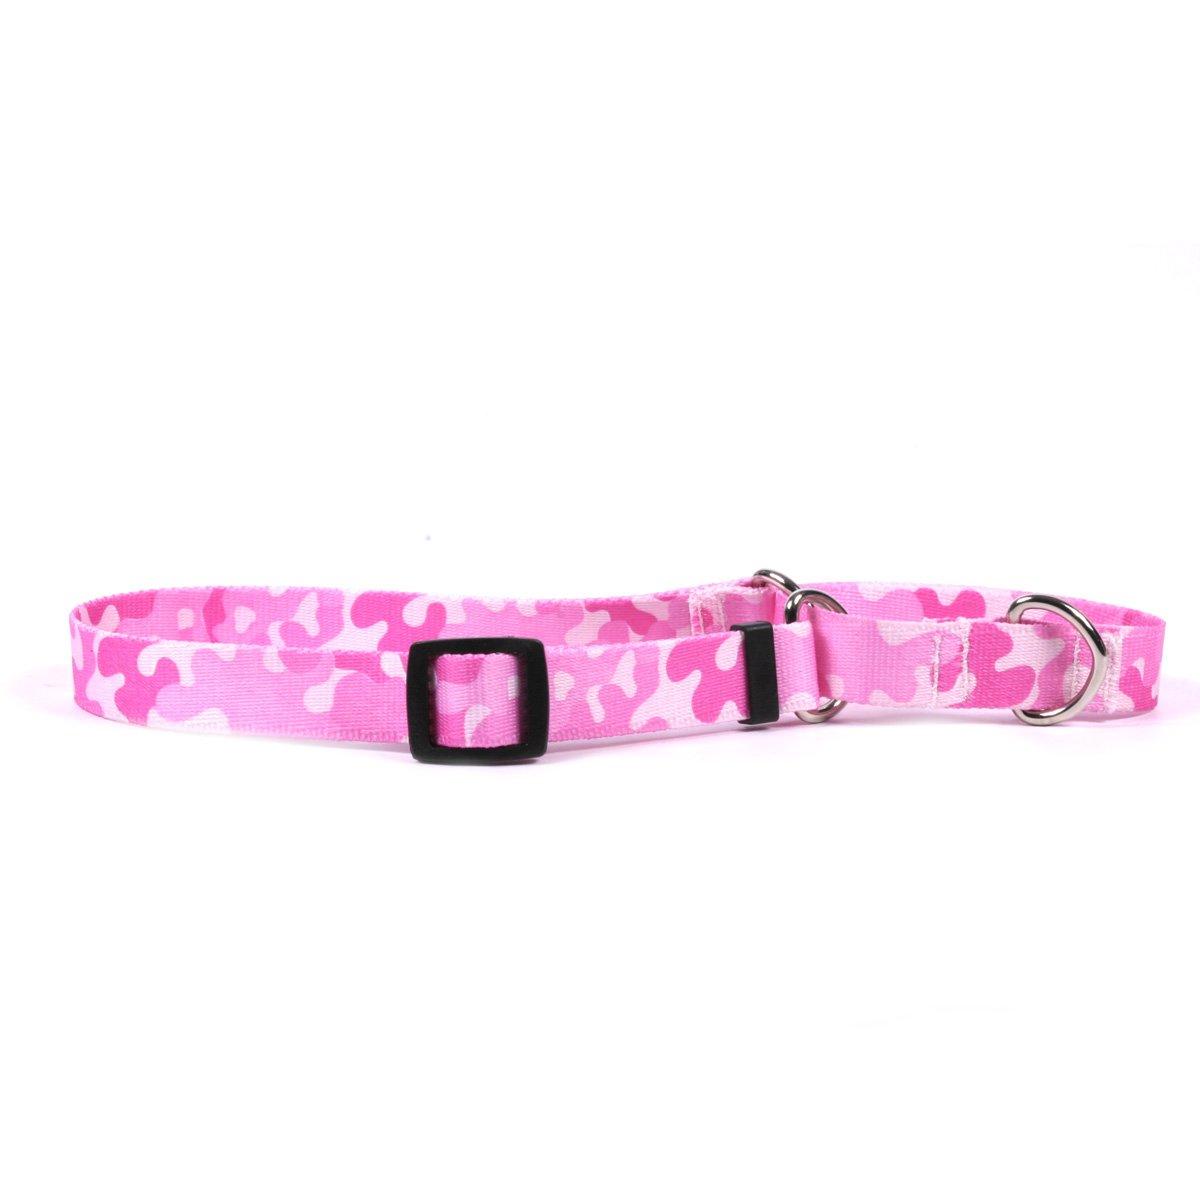 Camo Collection Yellow Dog Design Martingale Slip Collar